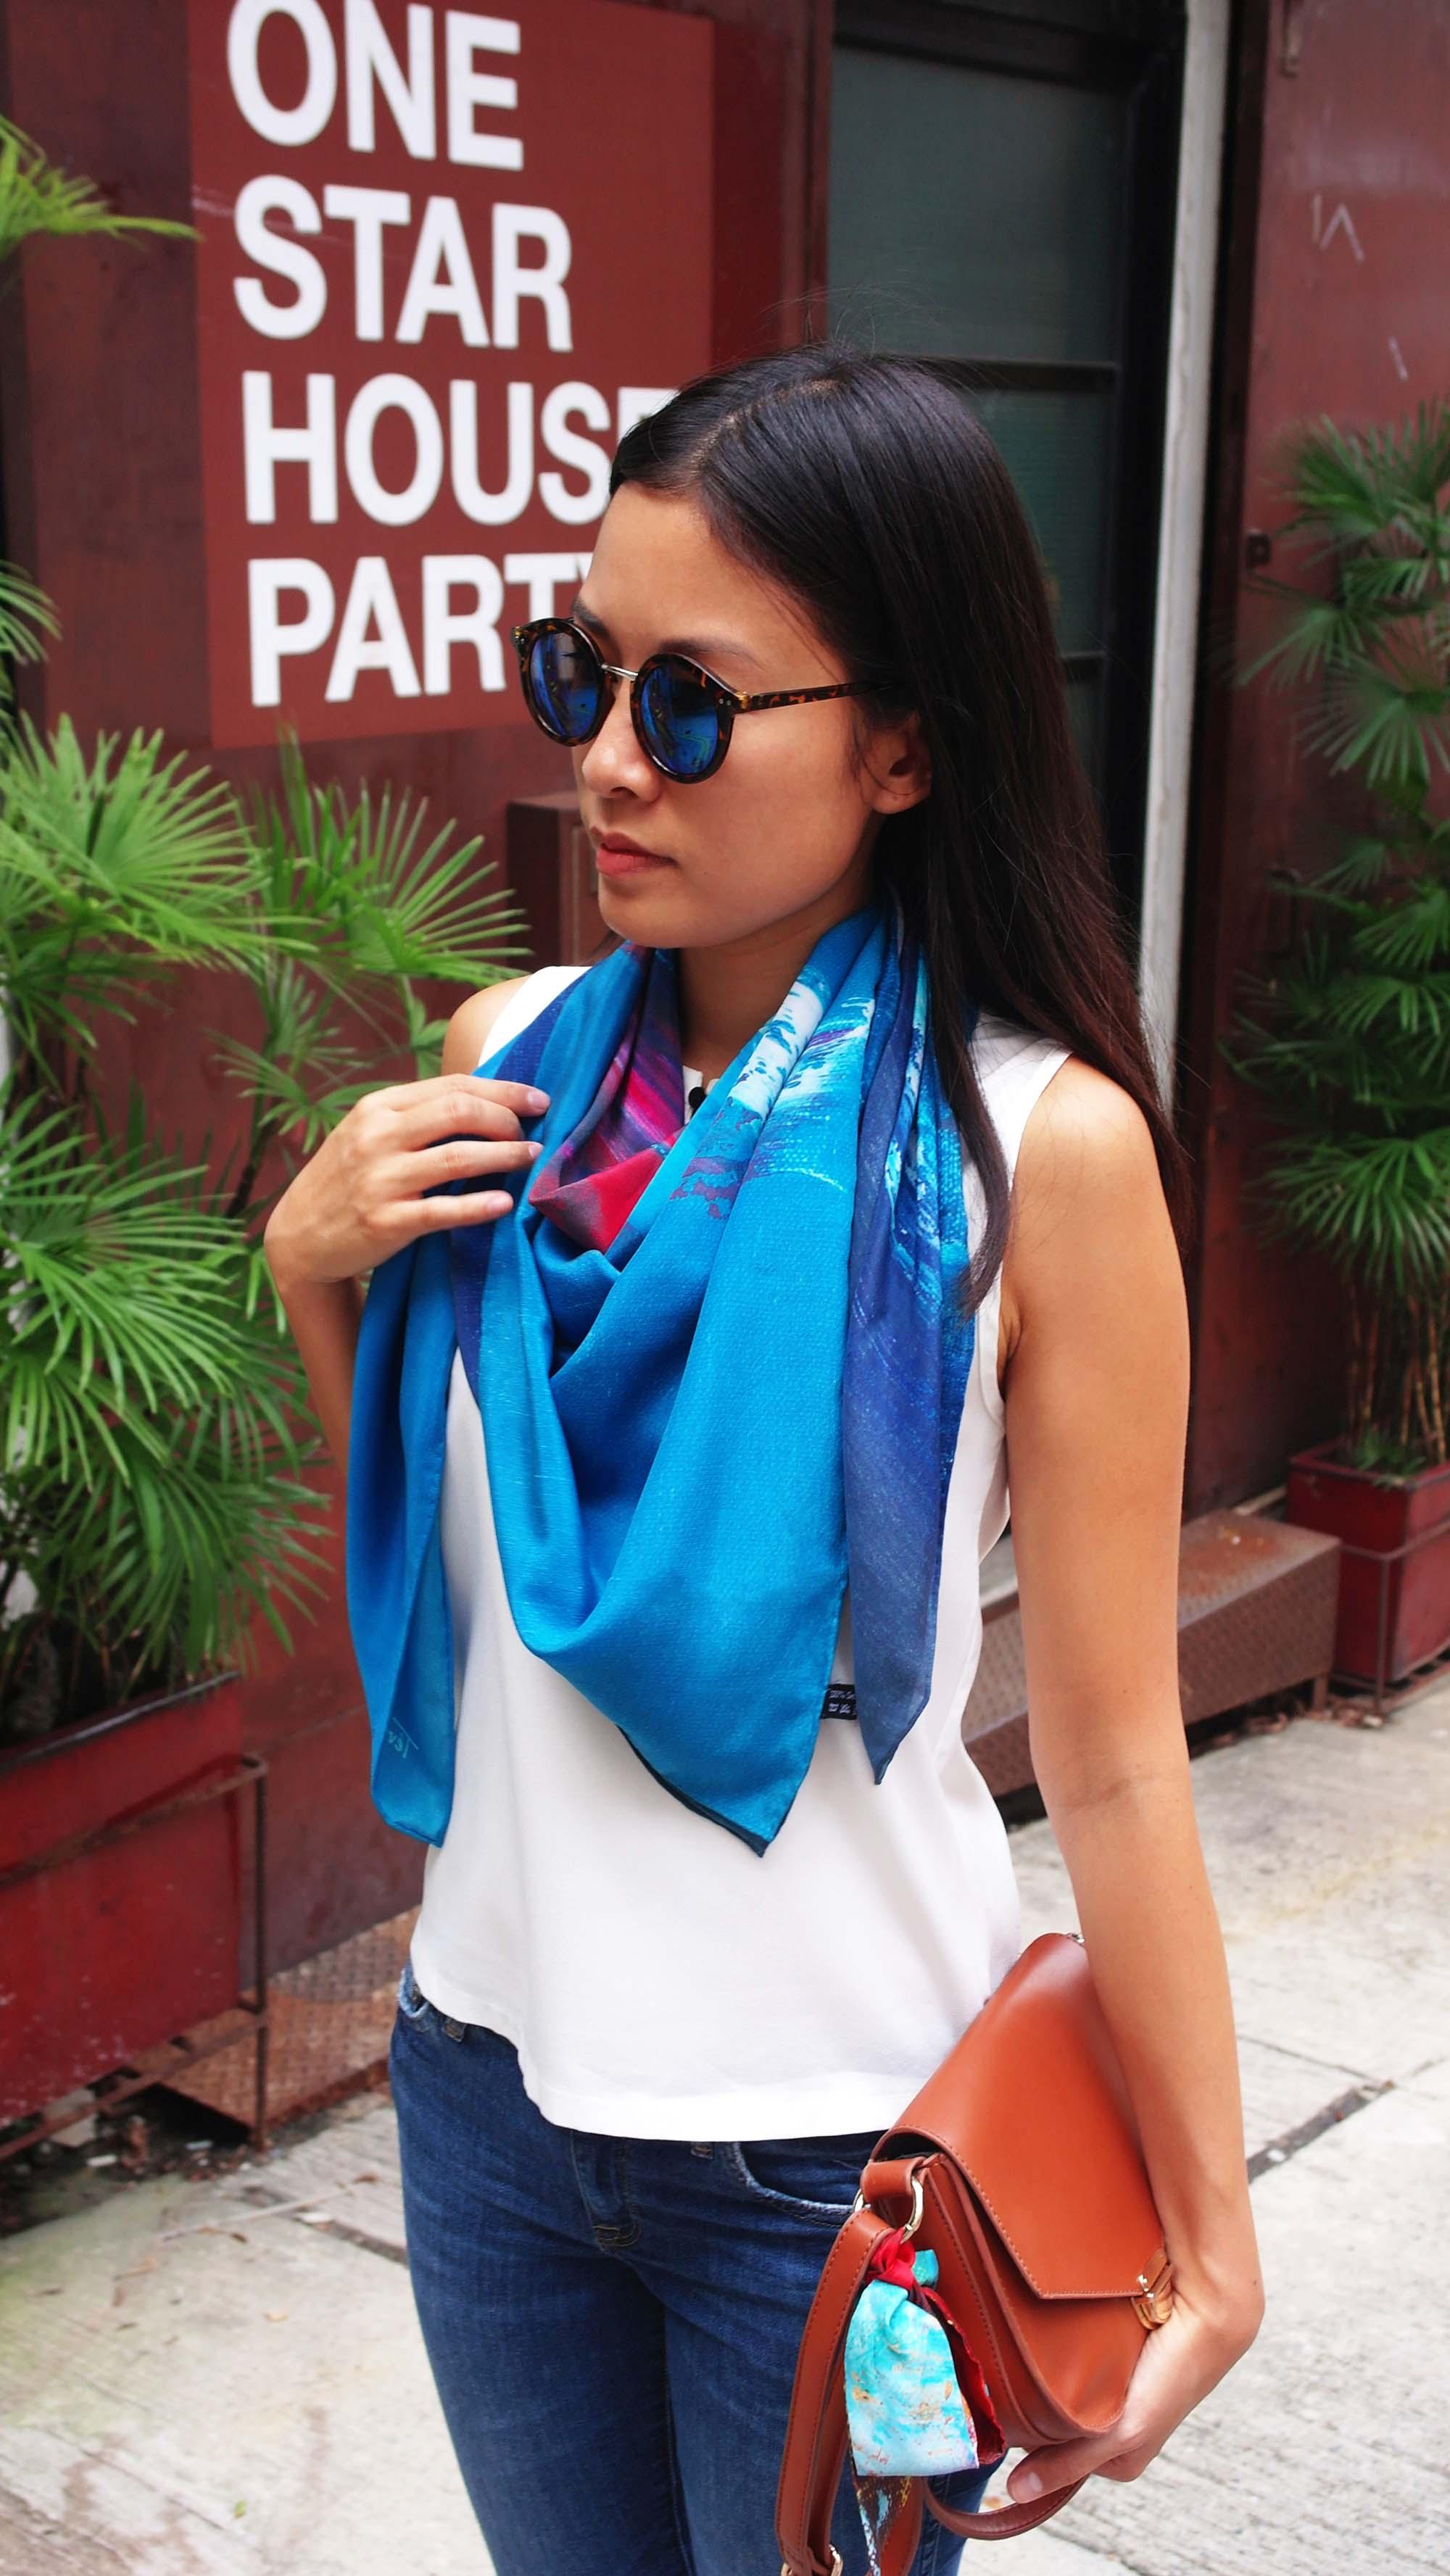 Azur silk scarf street